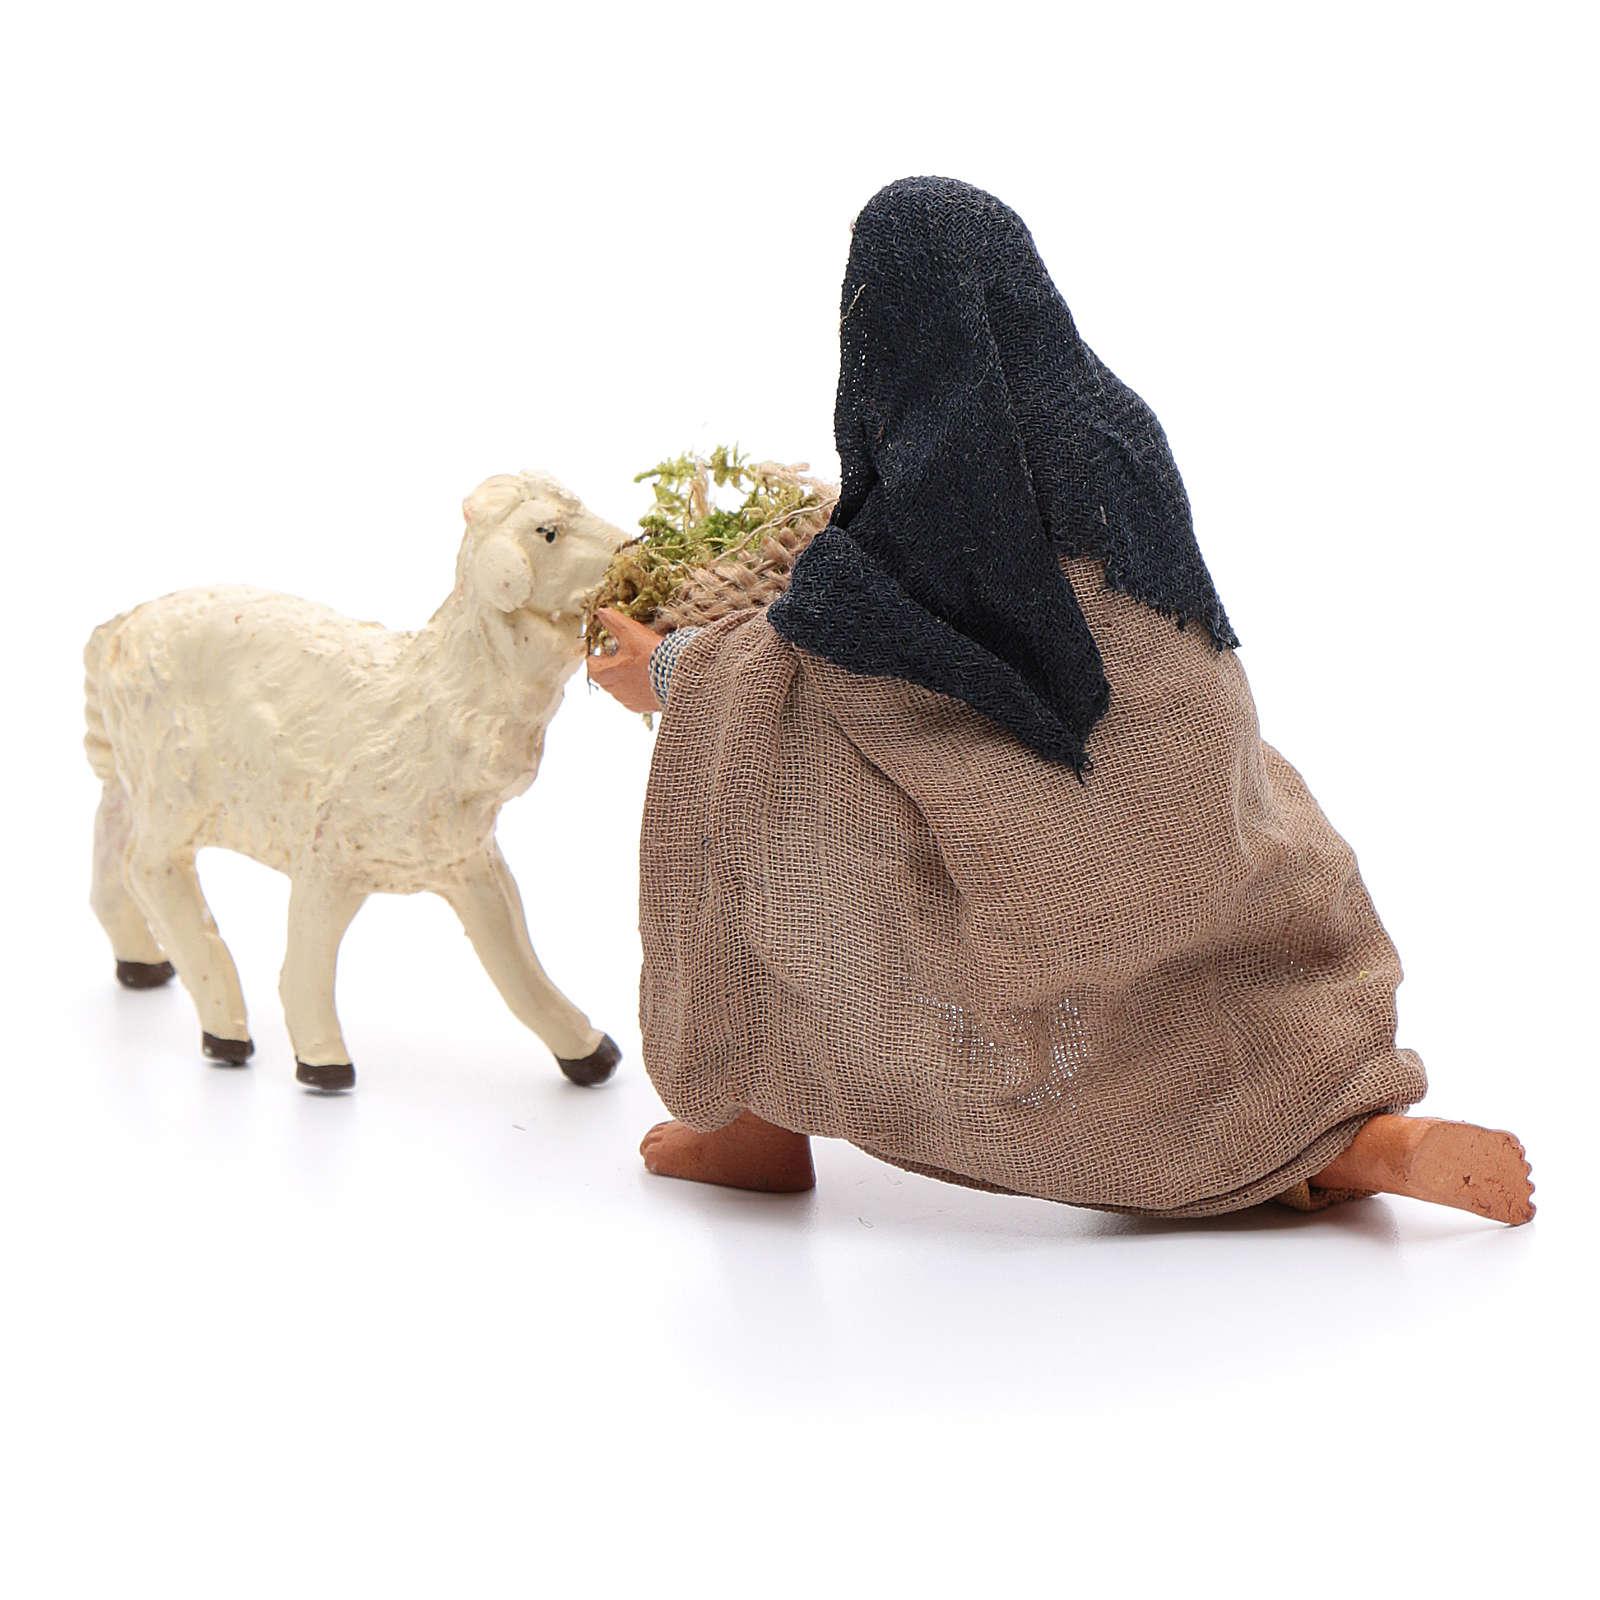 Pastor de rodillas que da de comer a una oveja 12 cm Belén napolitano 4